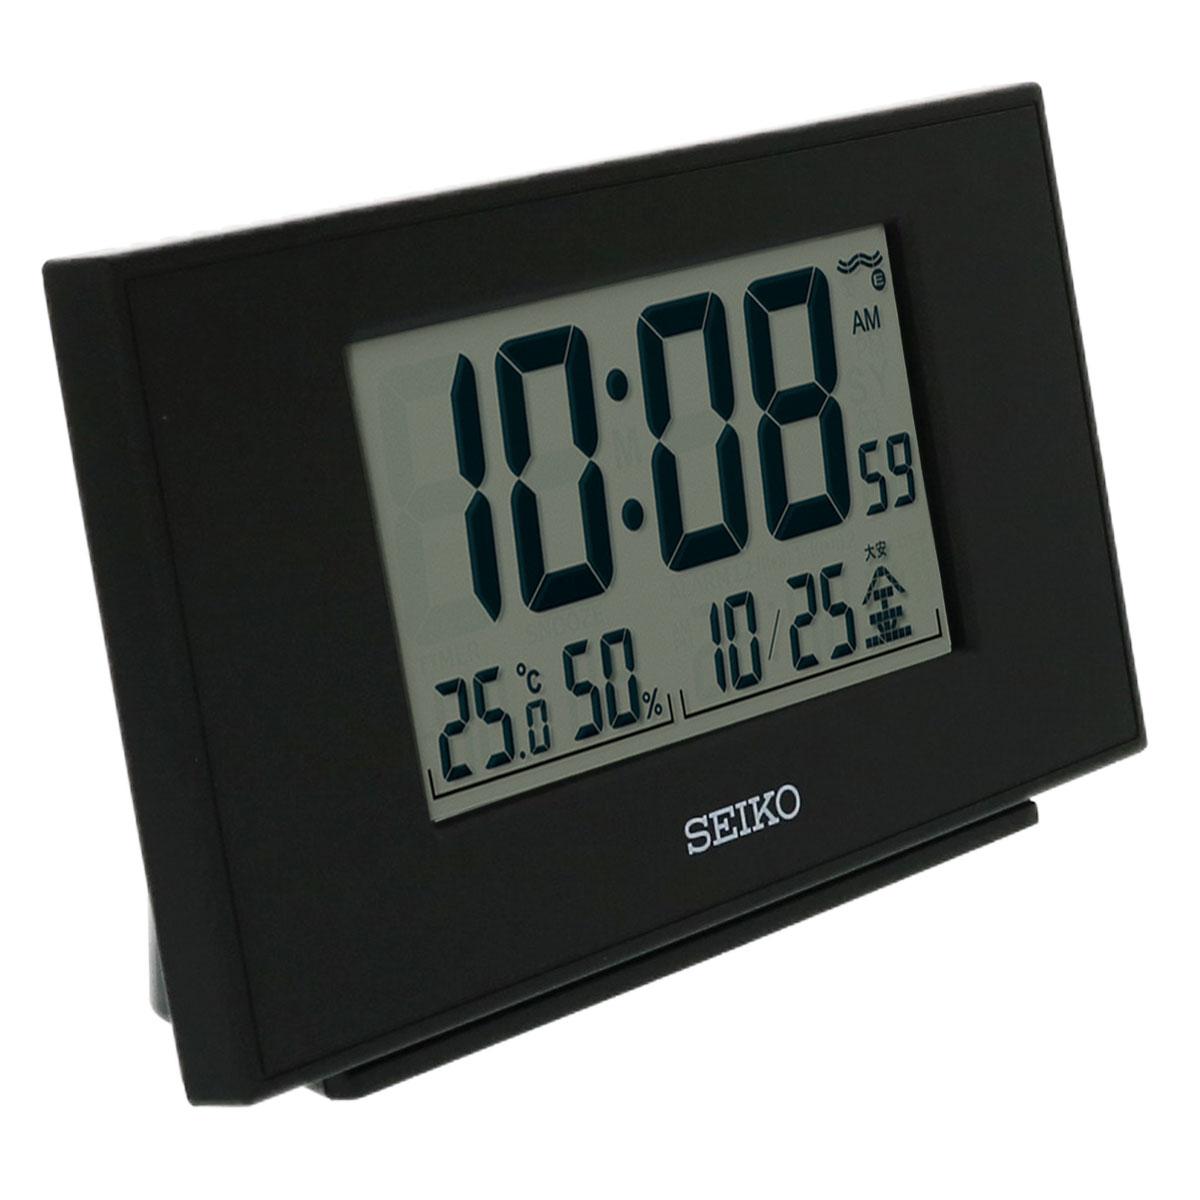 セイコー 温湿度計付電波時計 SQ790